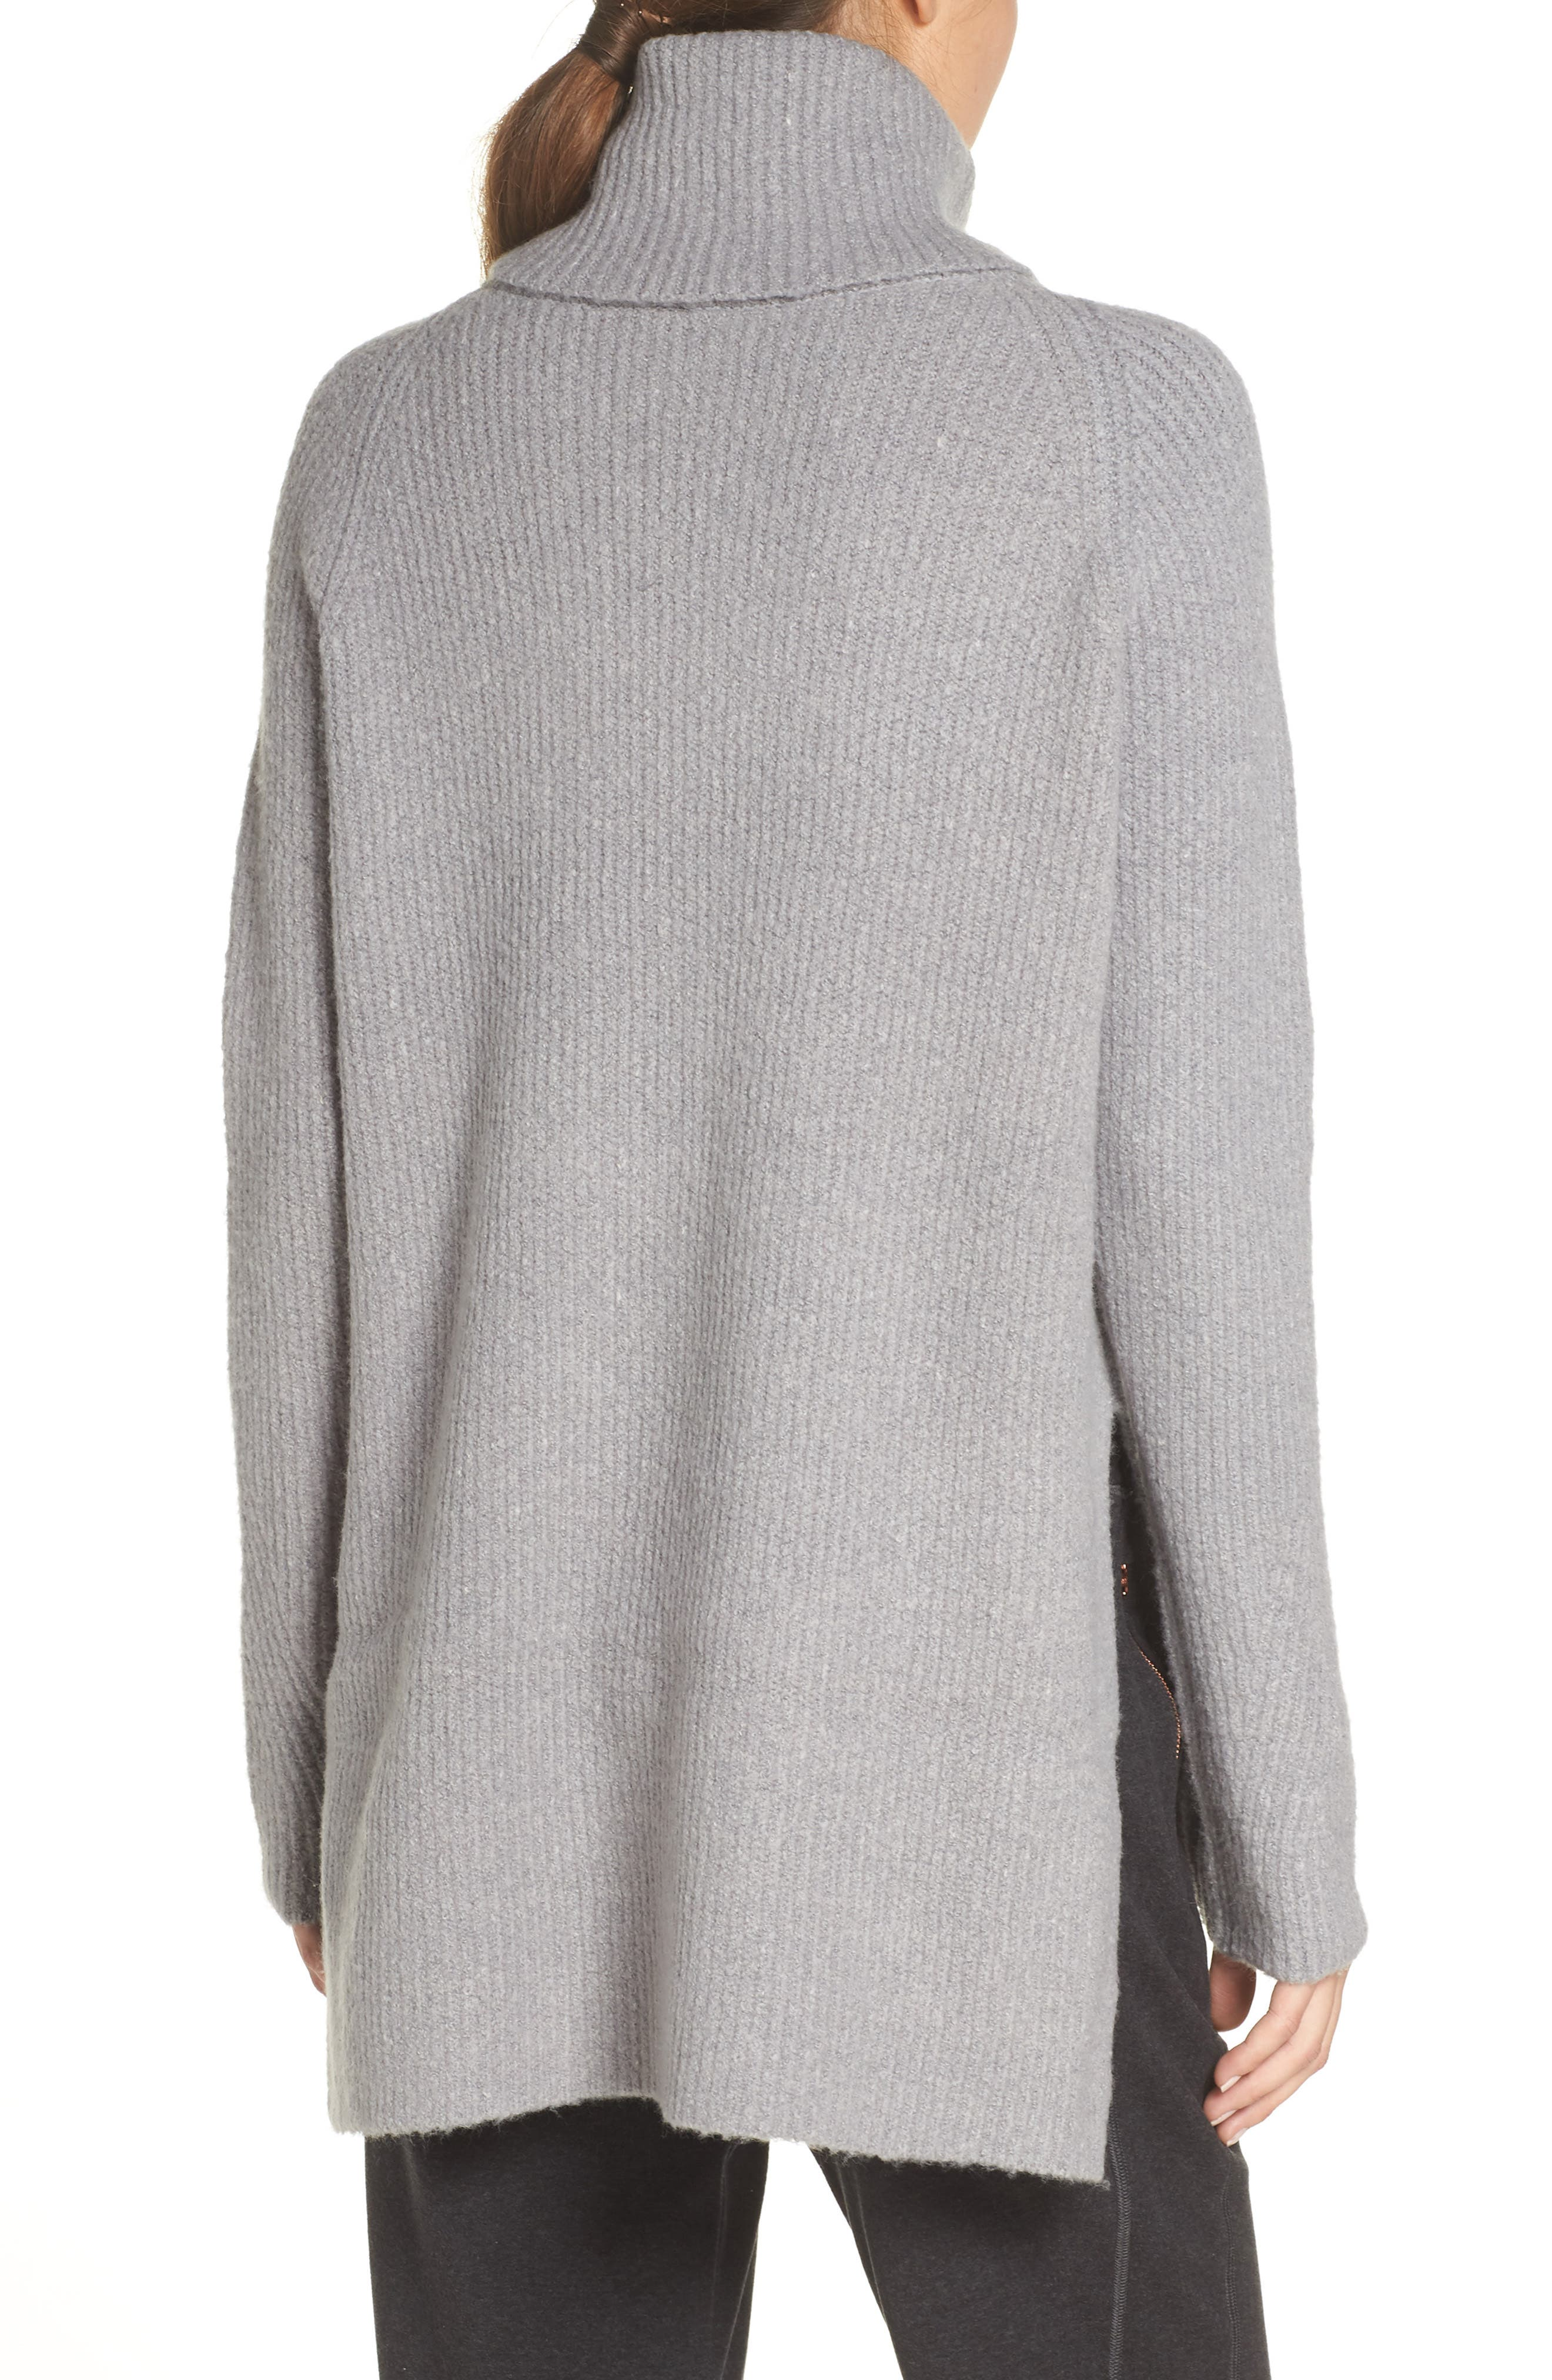 SWEATY BETTY,                             Shakti Oversize Sweater,                             Alternate thumbnail 2, color,                             023